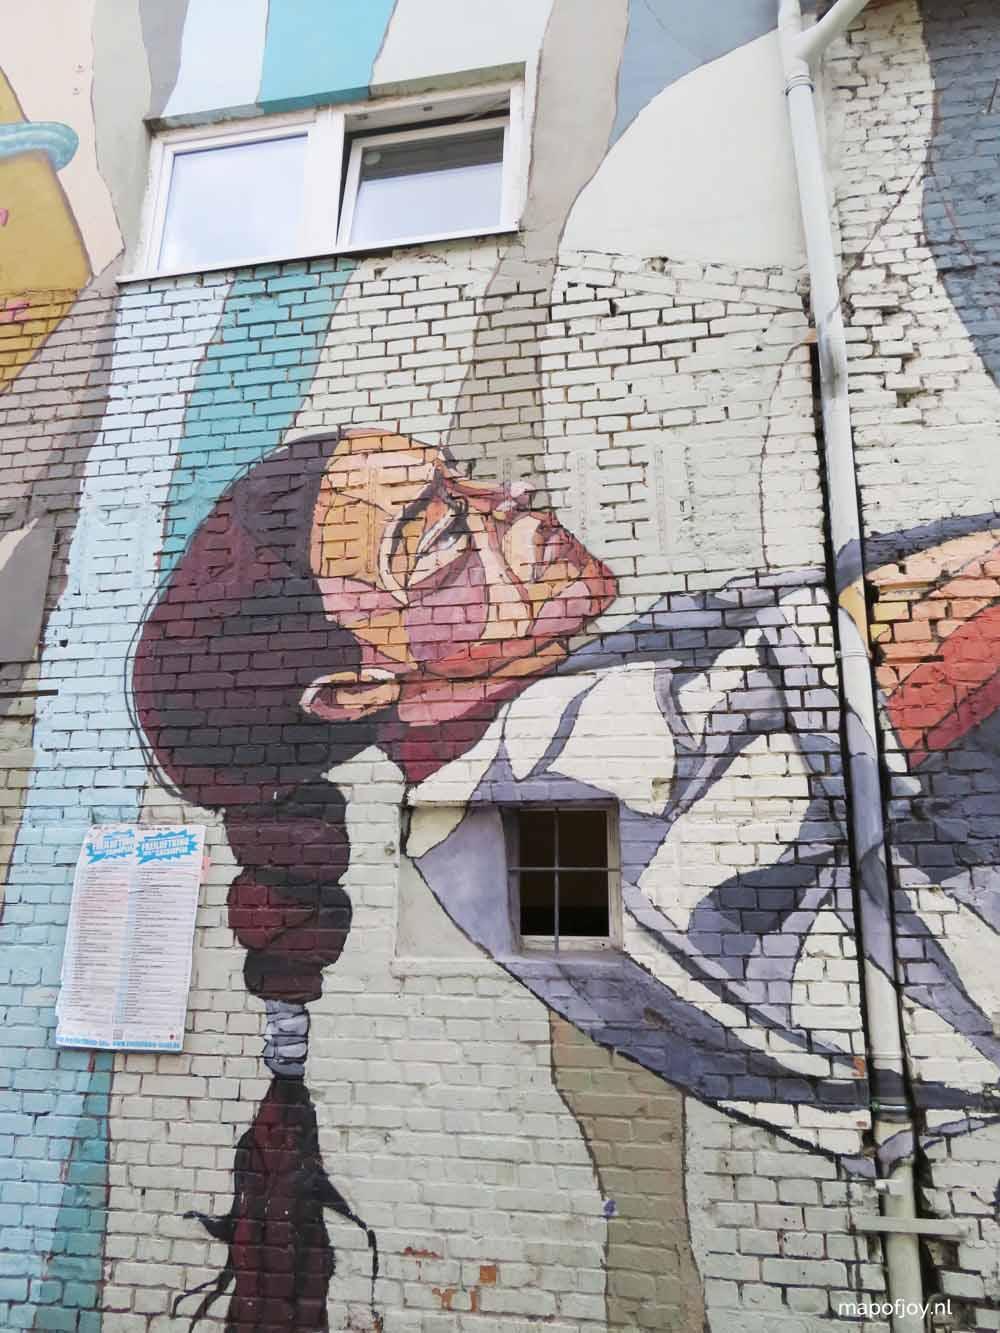 RAW-Gelände, street art Berlin - Map of Joy